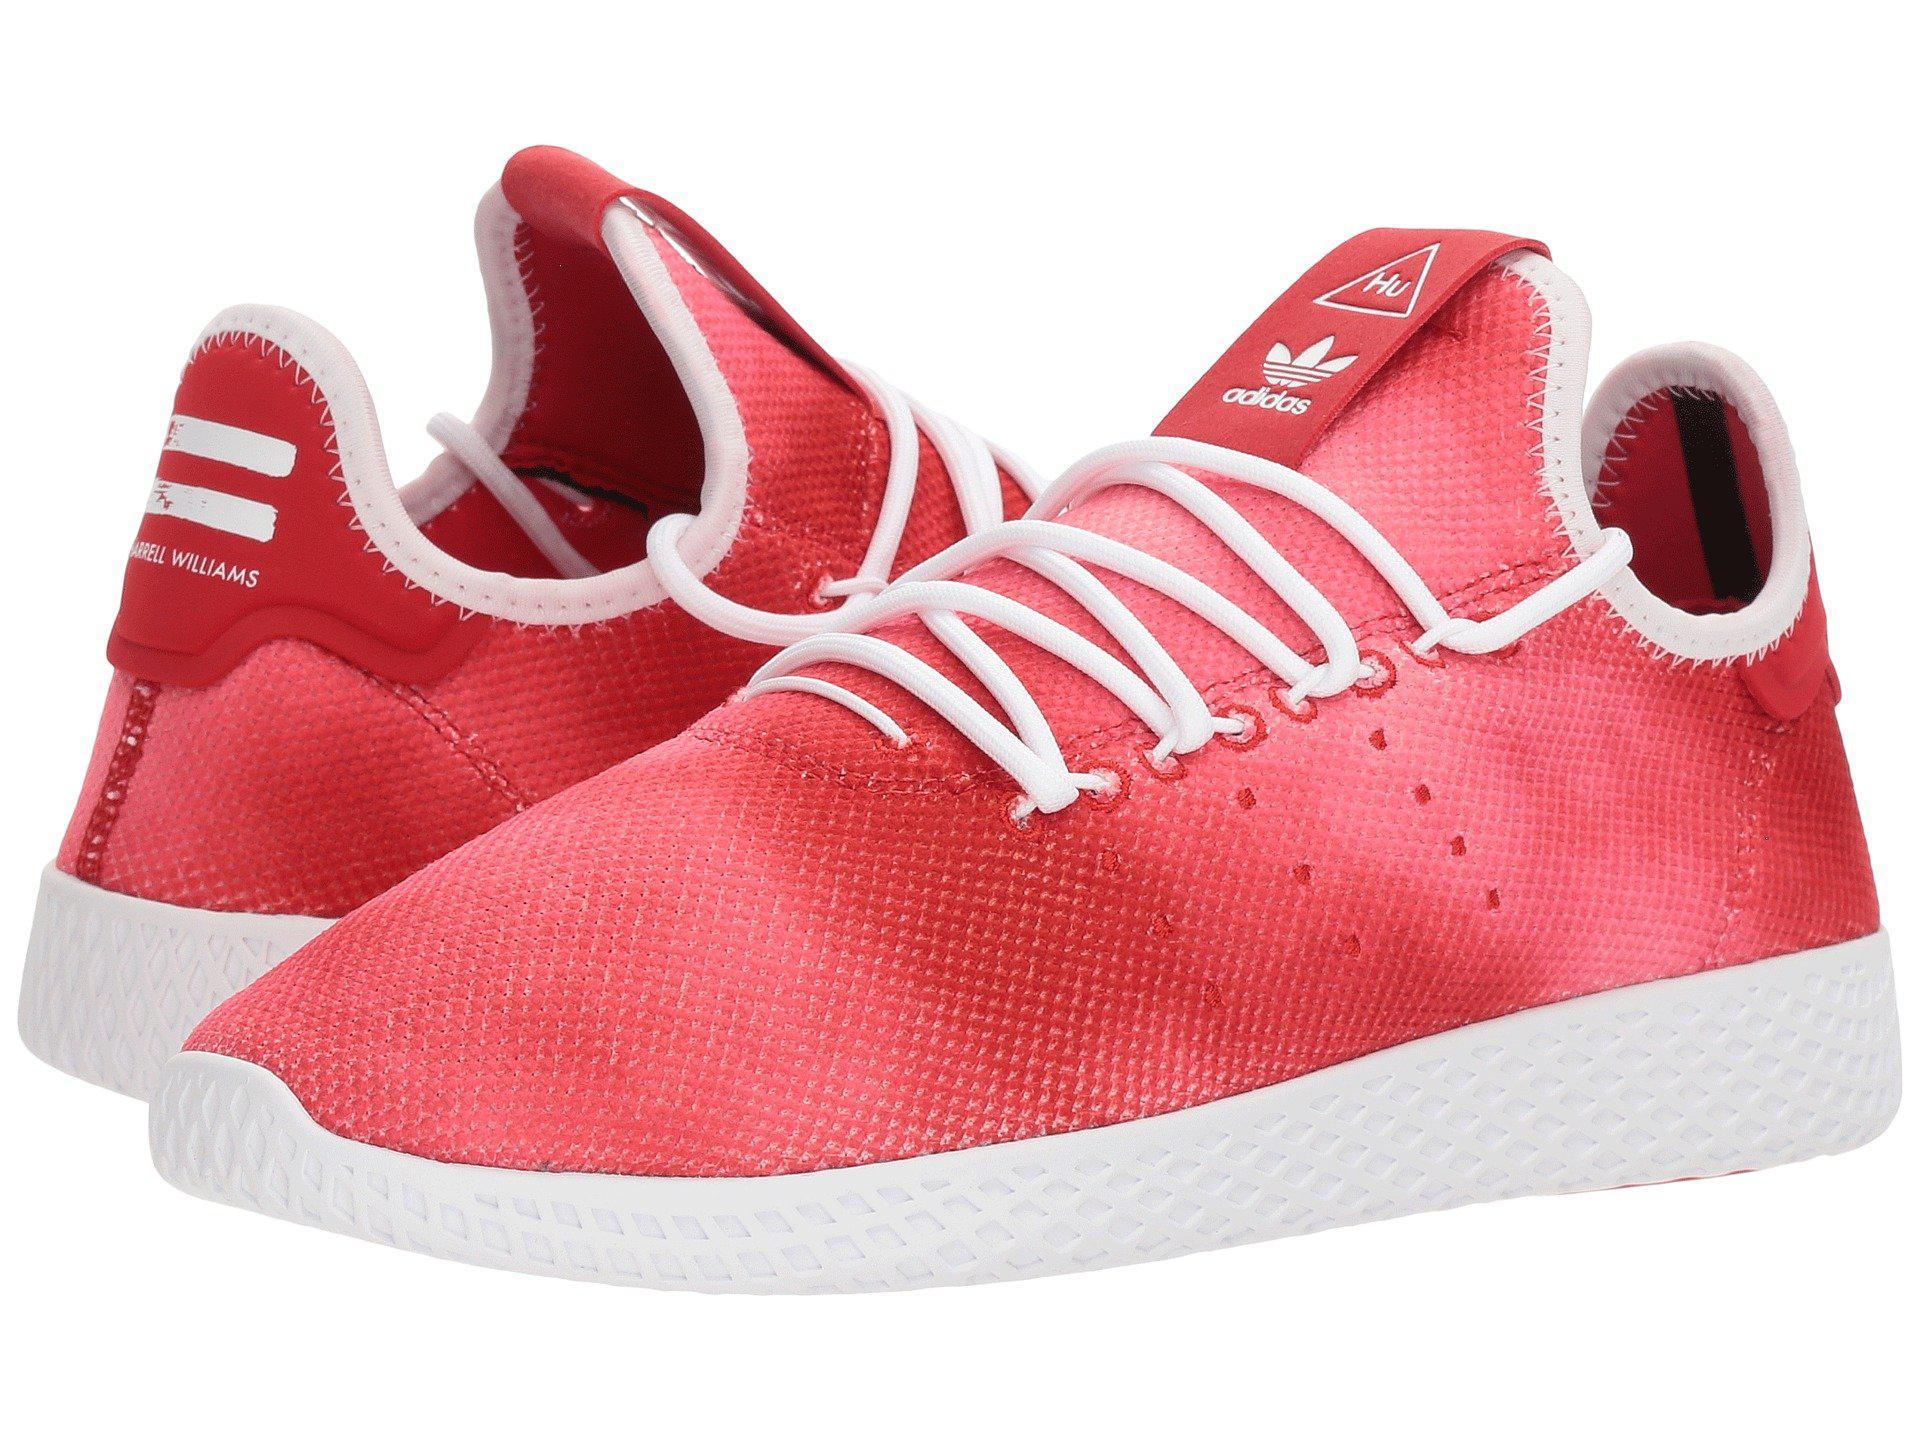 lyst adidas originali pharrell williams tennis razza umana (scarlet